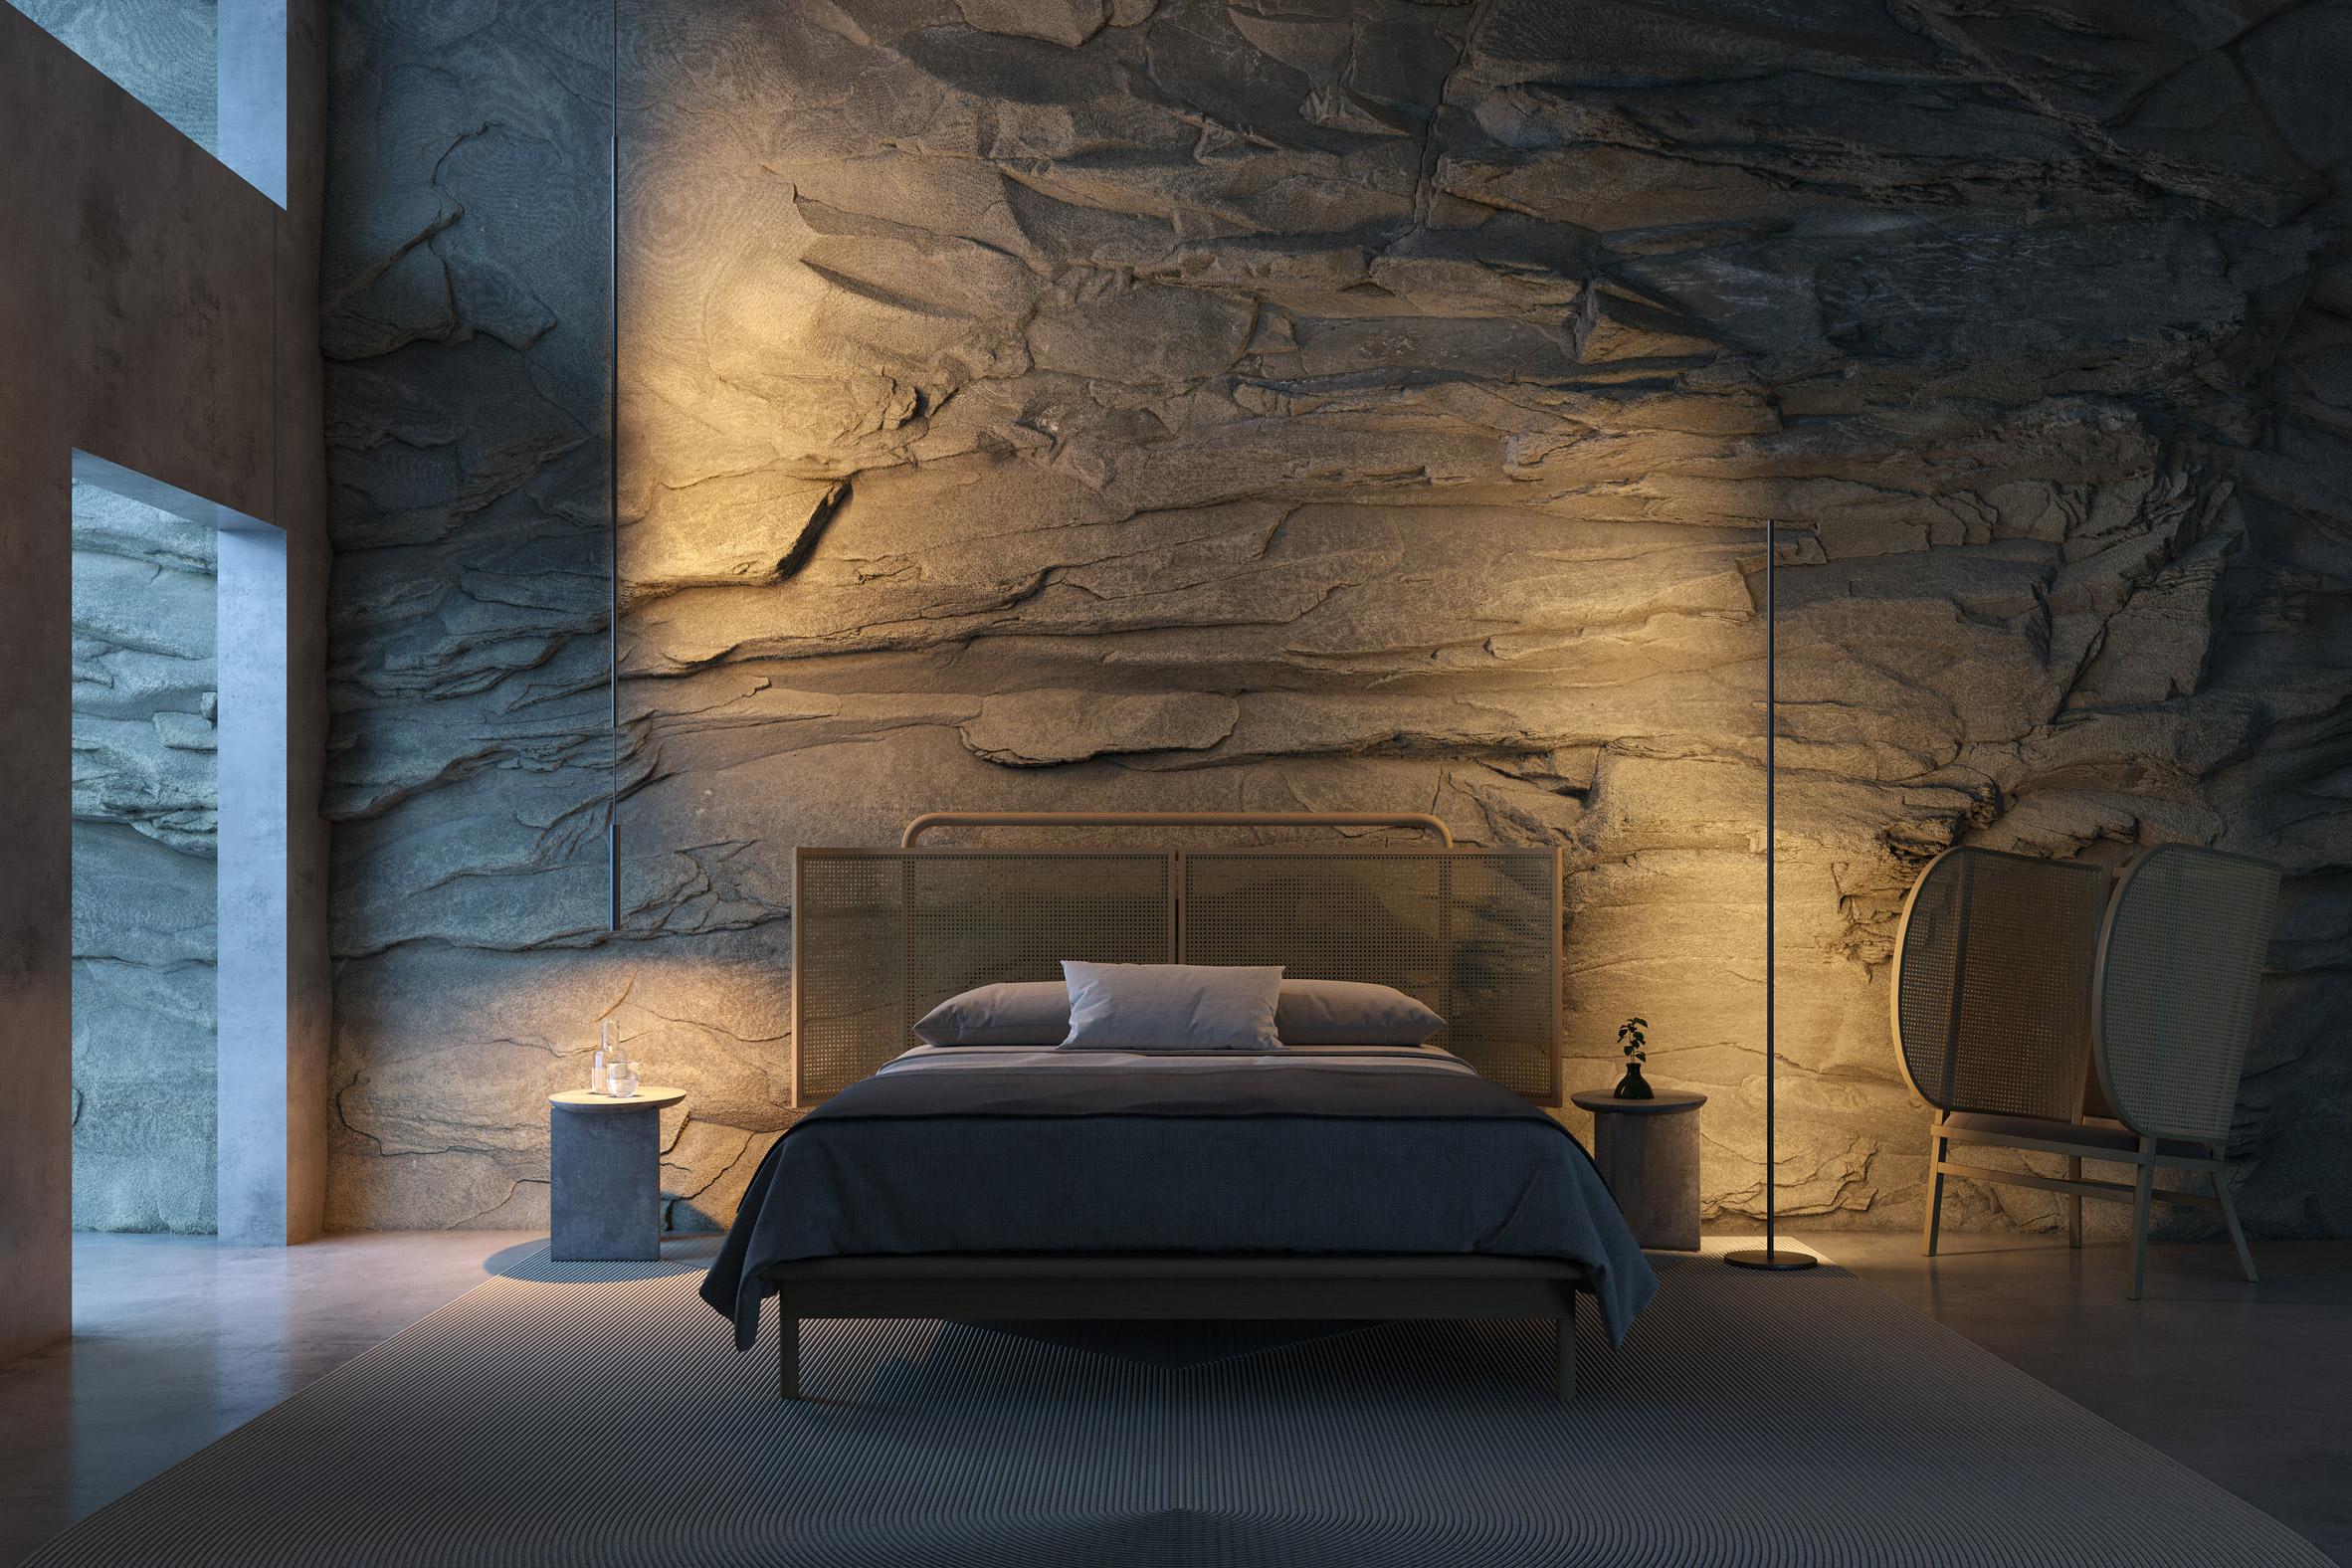 XYZ modular lighting collection by Bybeau Studio